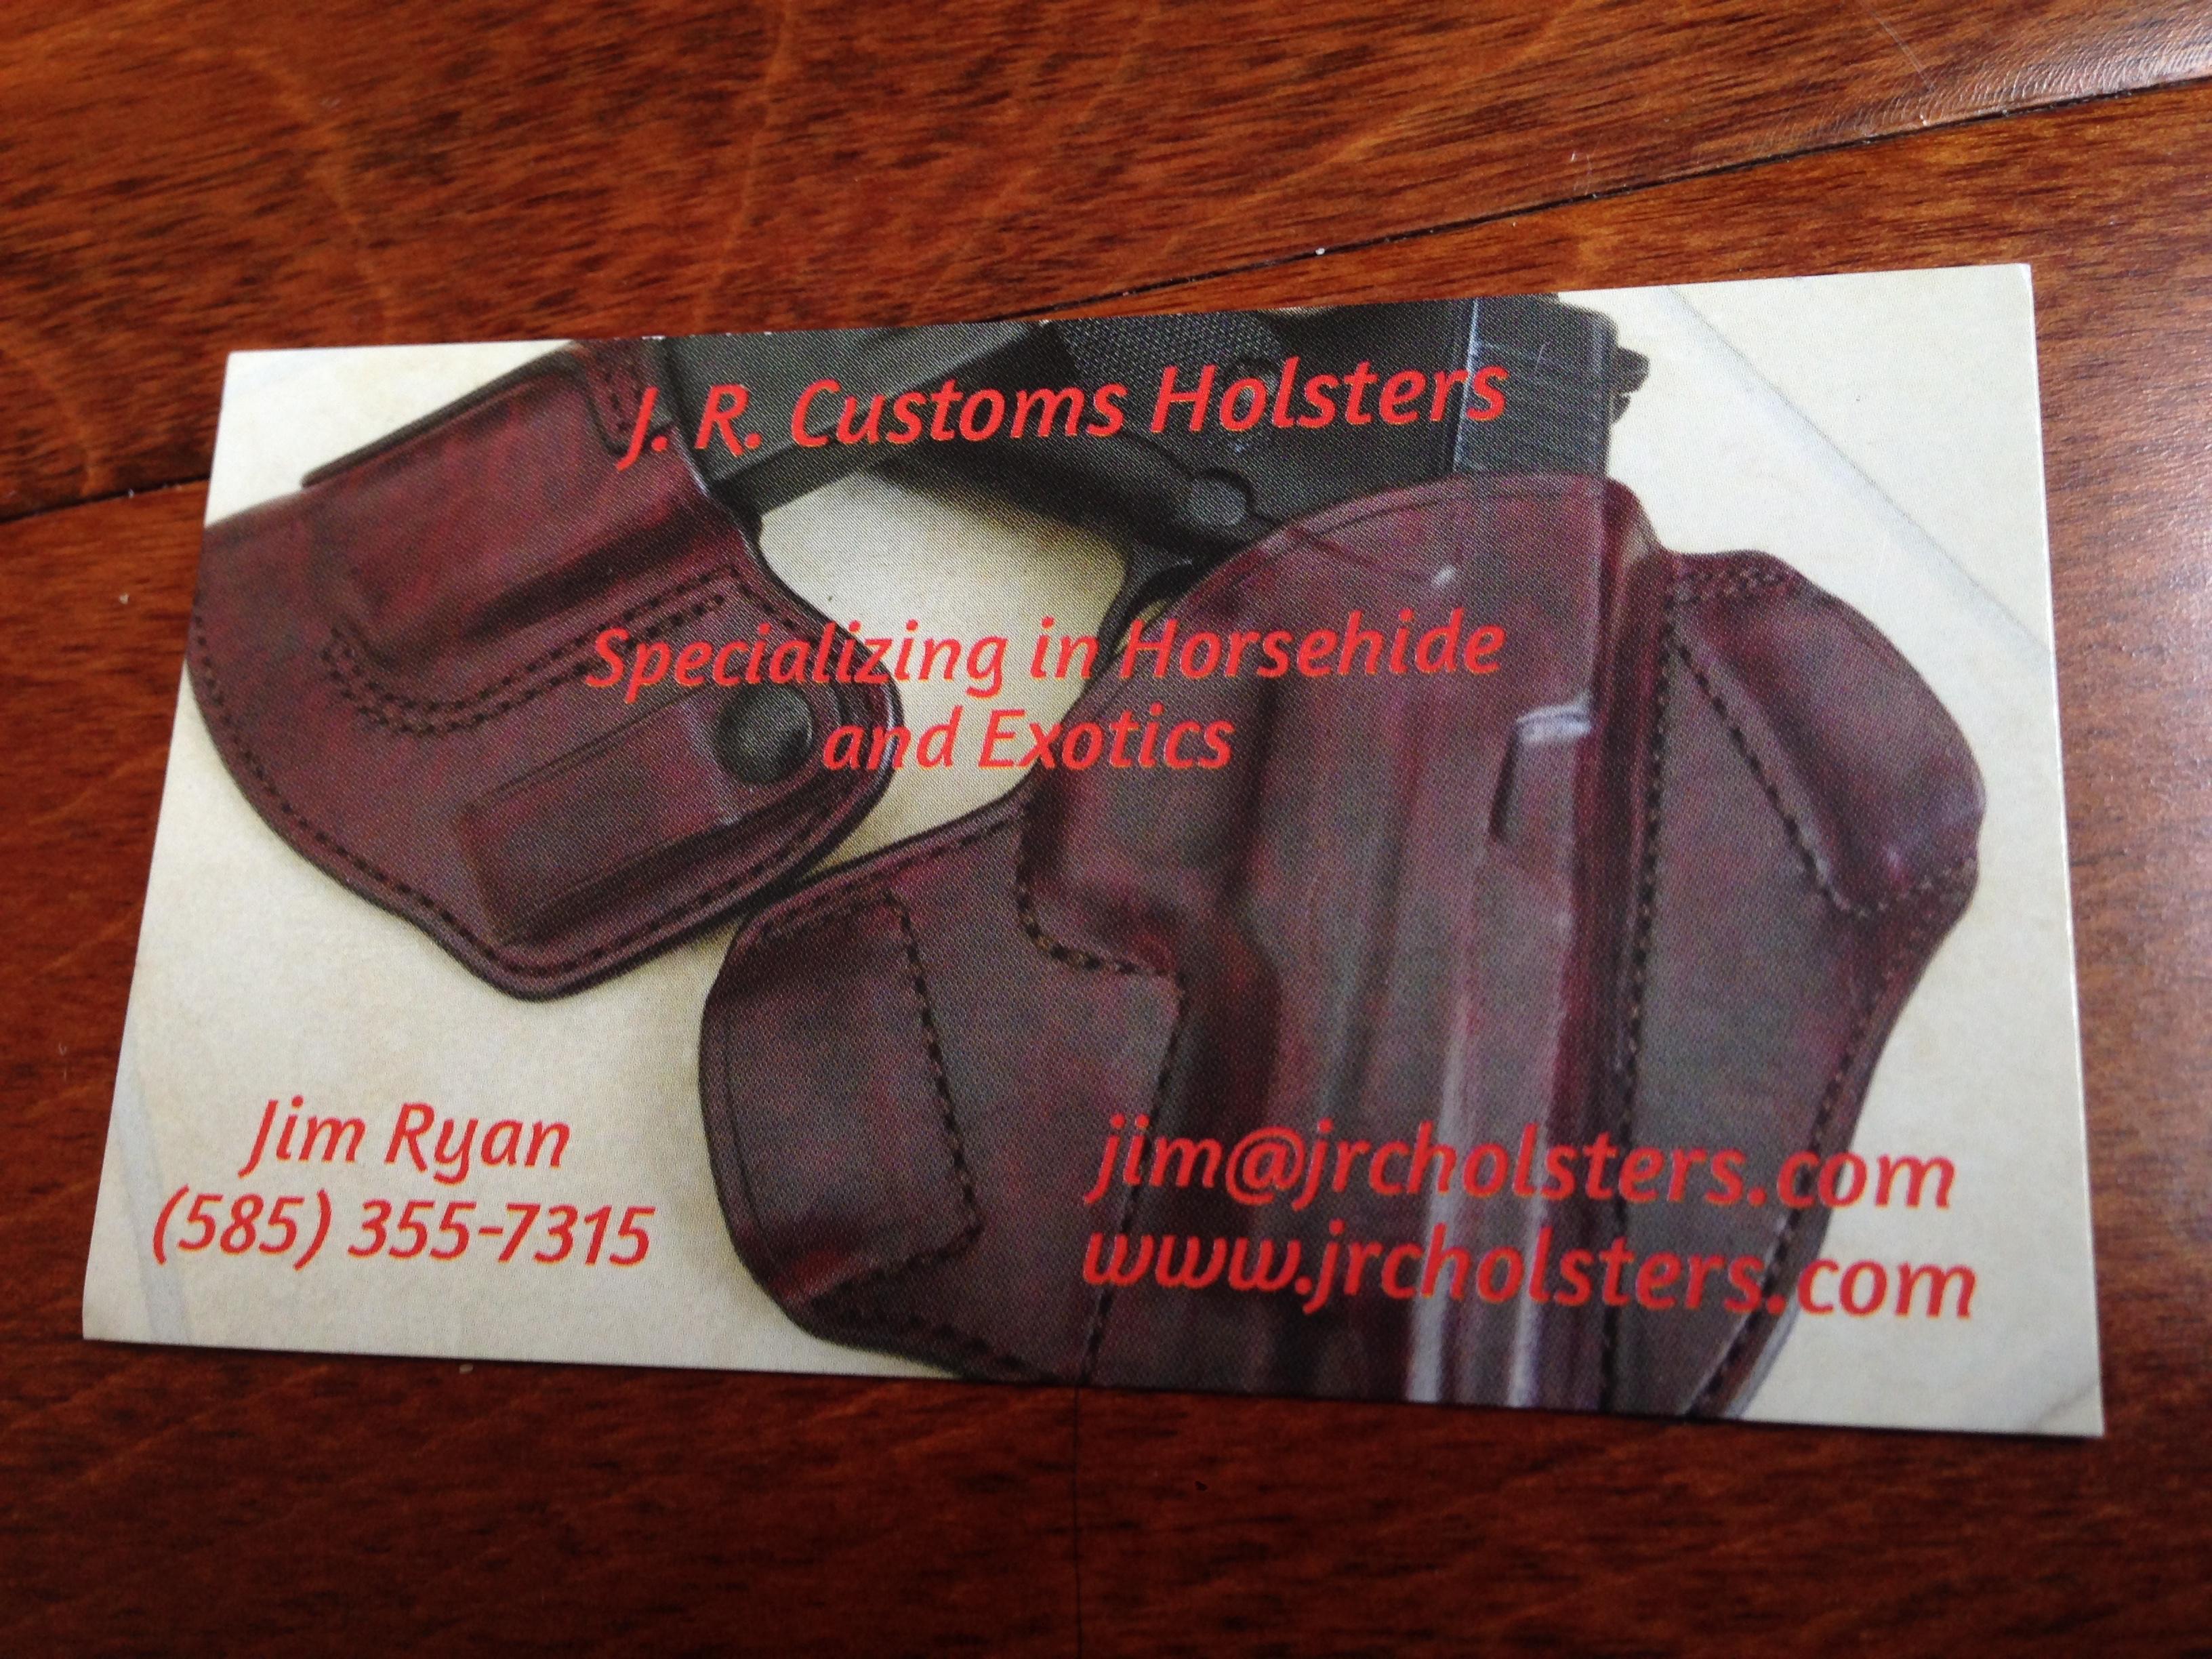 J.R. Customs Horsehide AIWB/CDA II Holster P30L, Black w/ Red Wildebeest 0 Shipped-fullsizeoutput_11f.jpeg